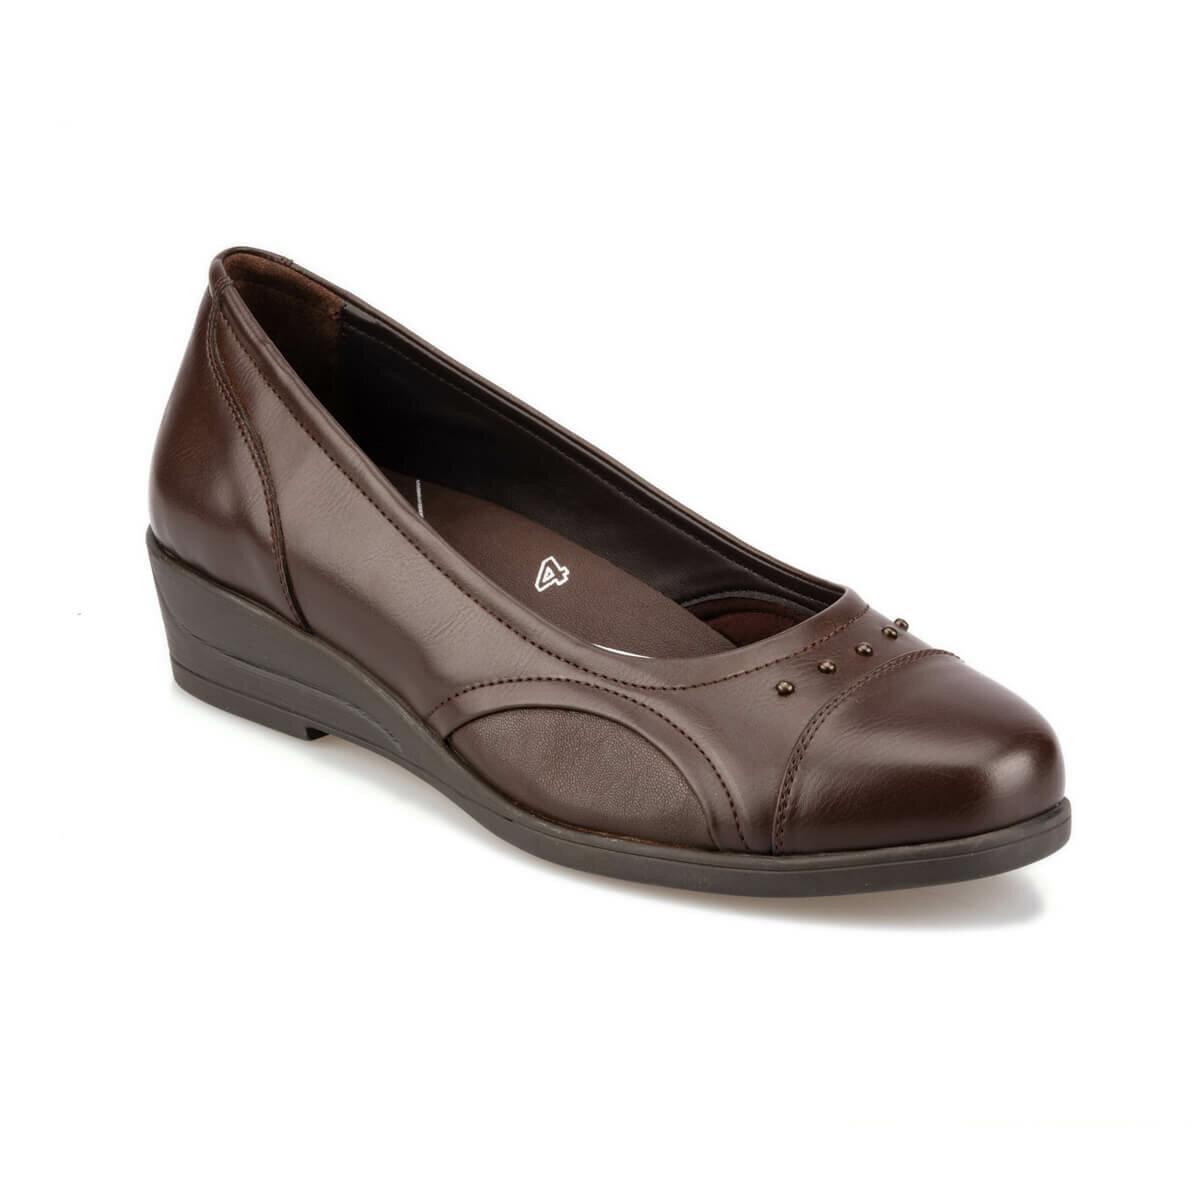 FLO 92.101025.Z Brown Women 'S Wedges Shoes Polaris 5 Point